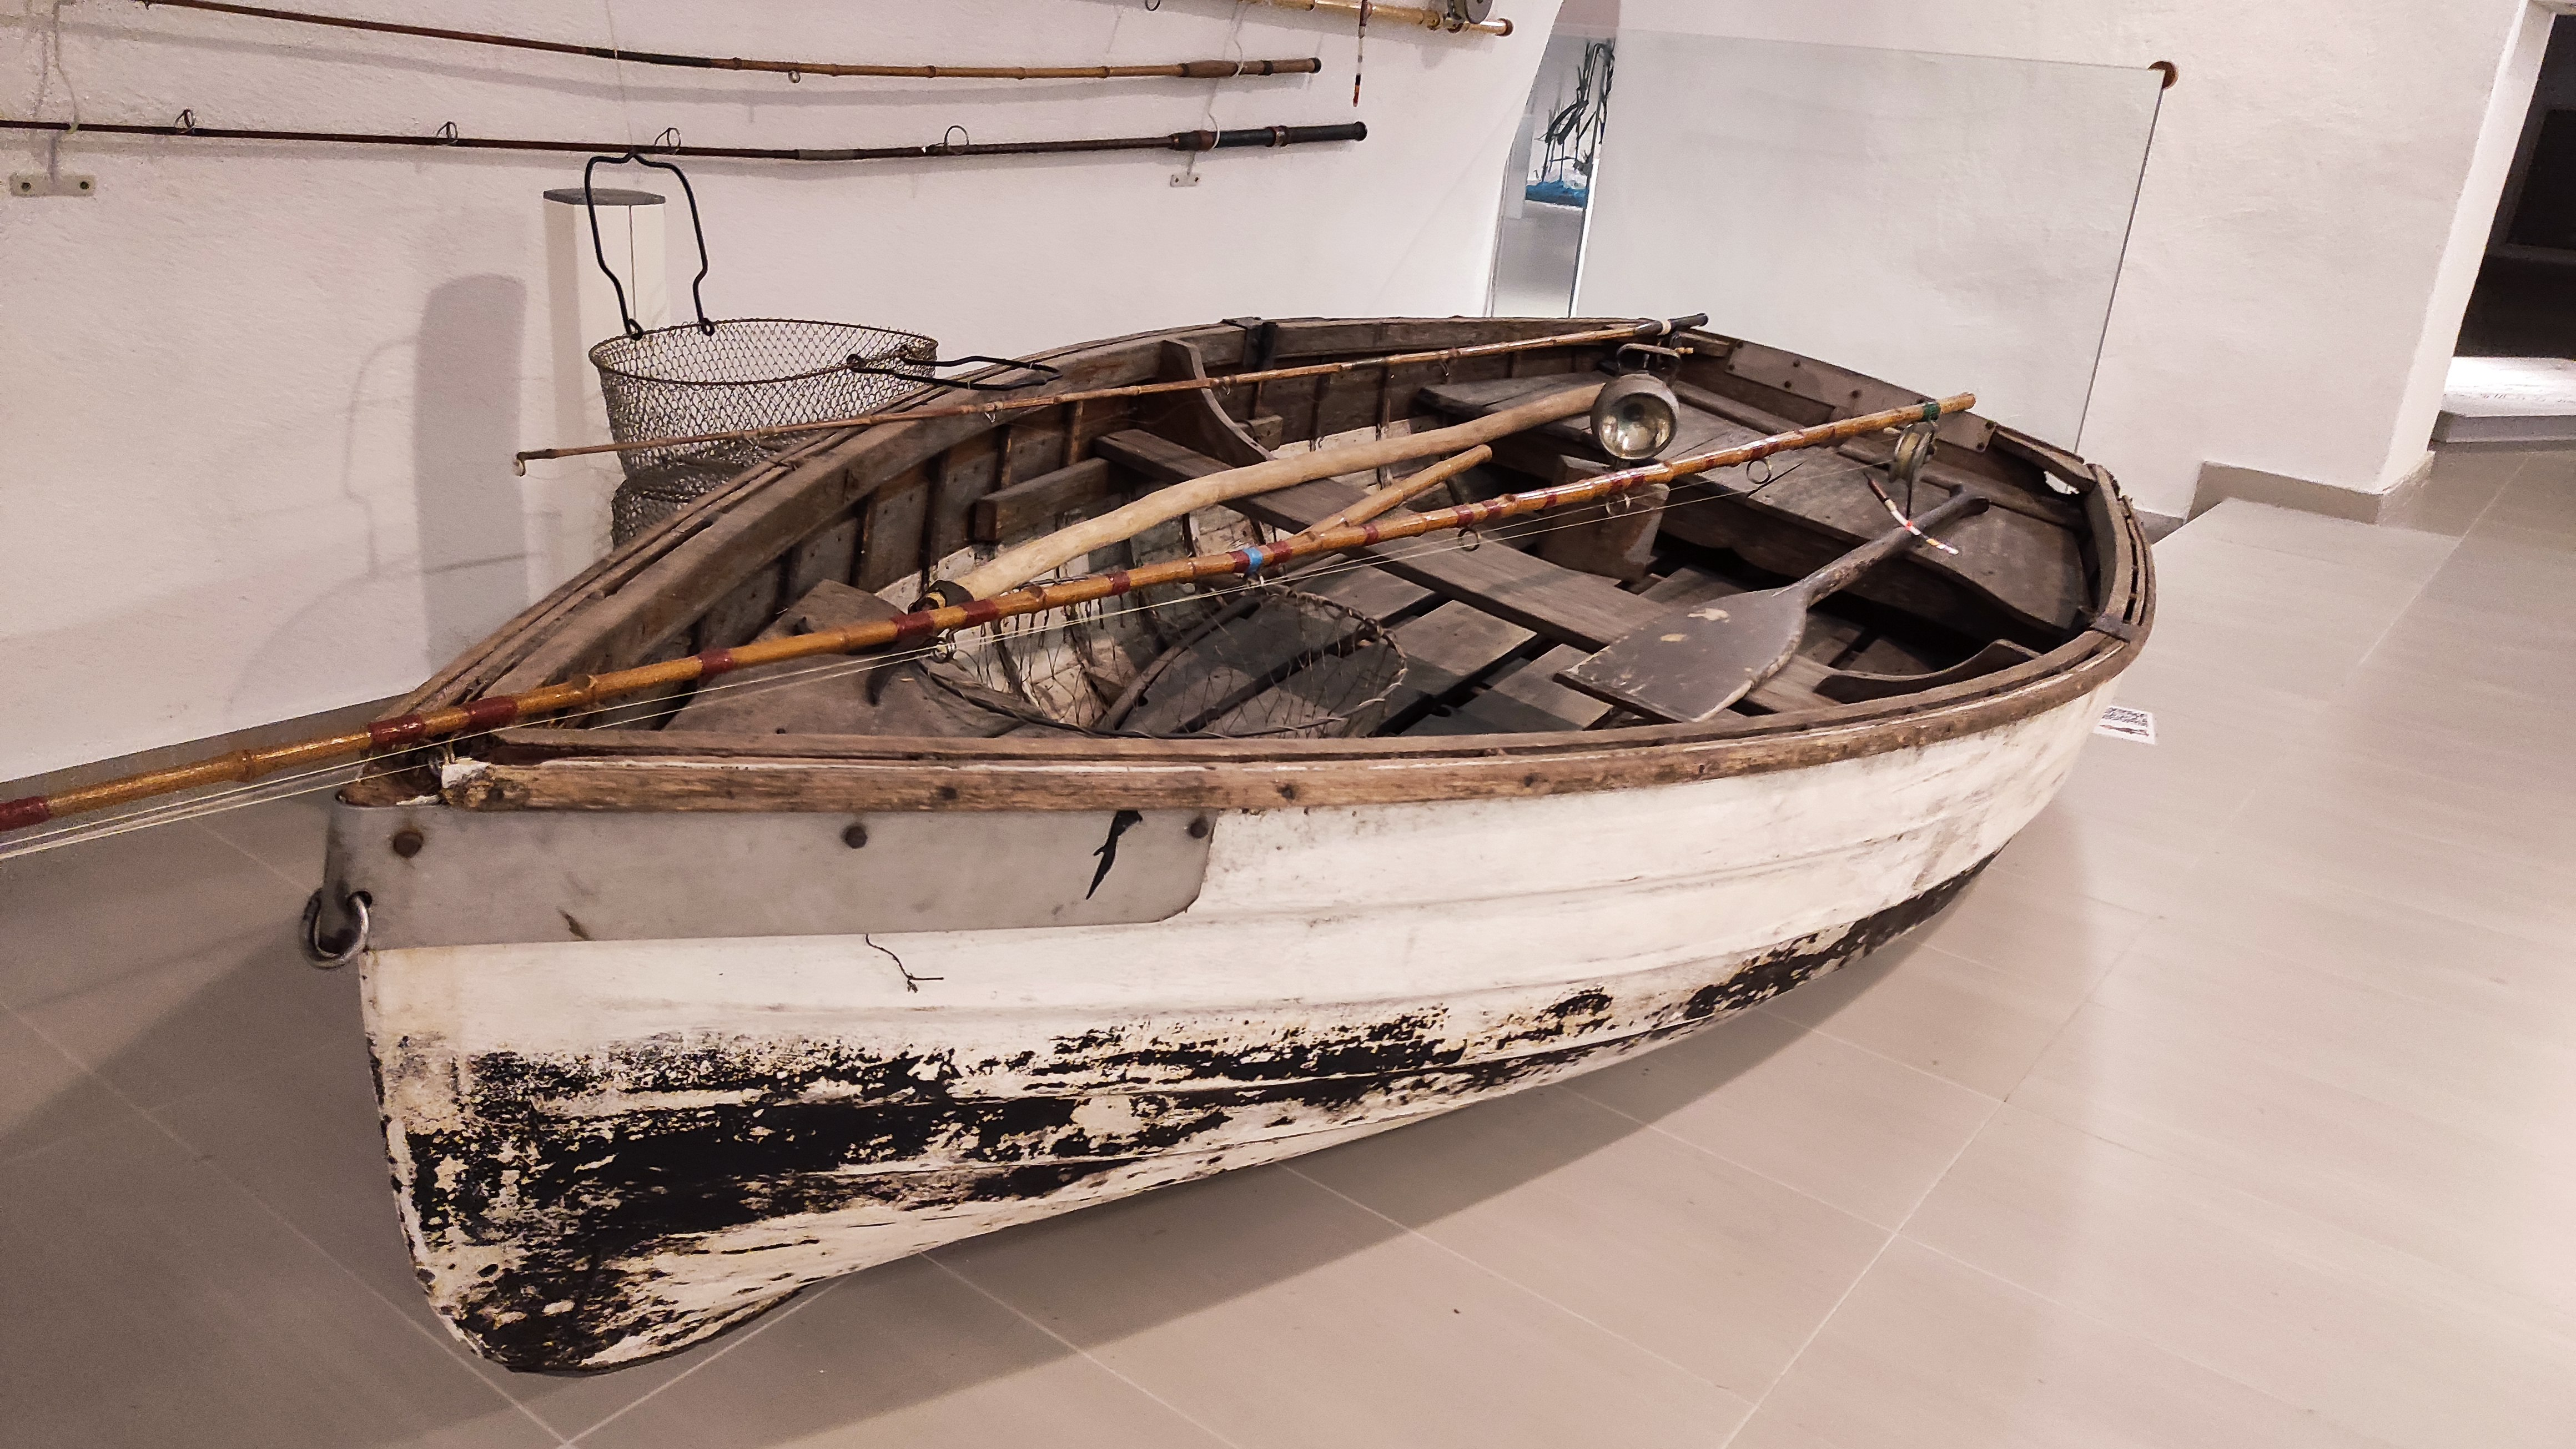 Kirandulastervezo-Hatvan-Vadaszati-Muzeum-16.jpg